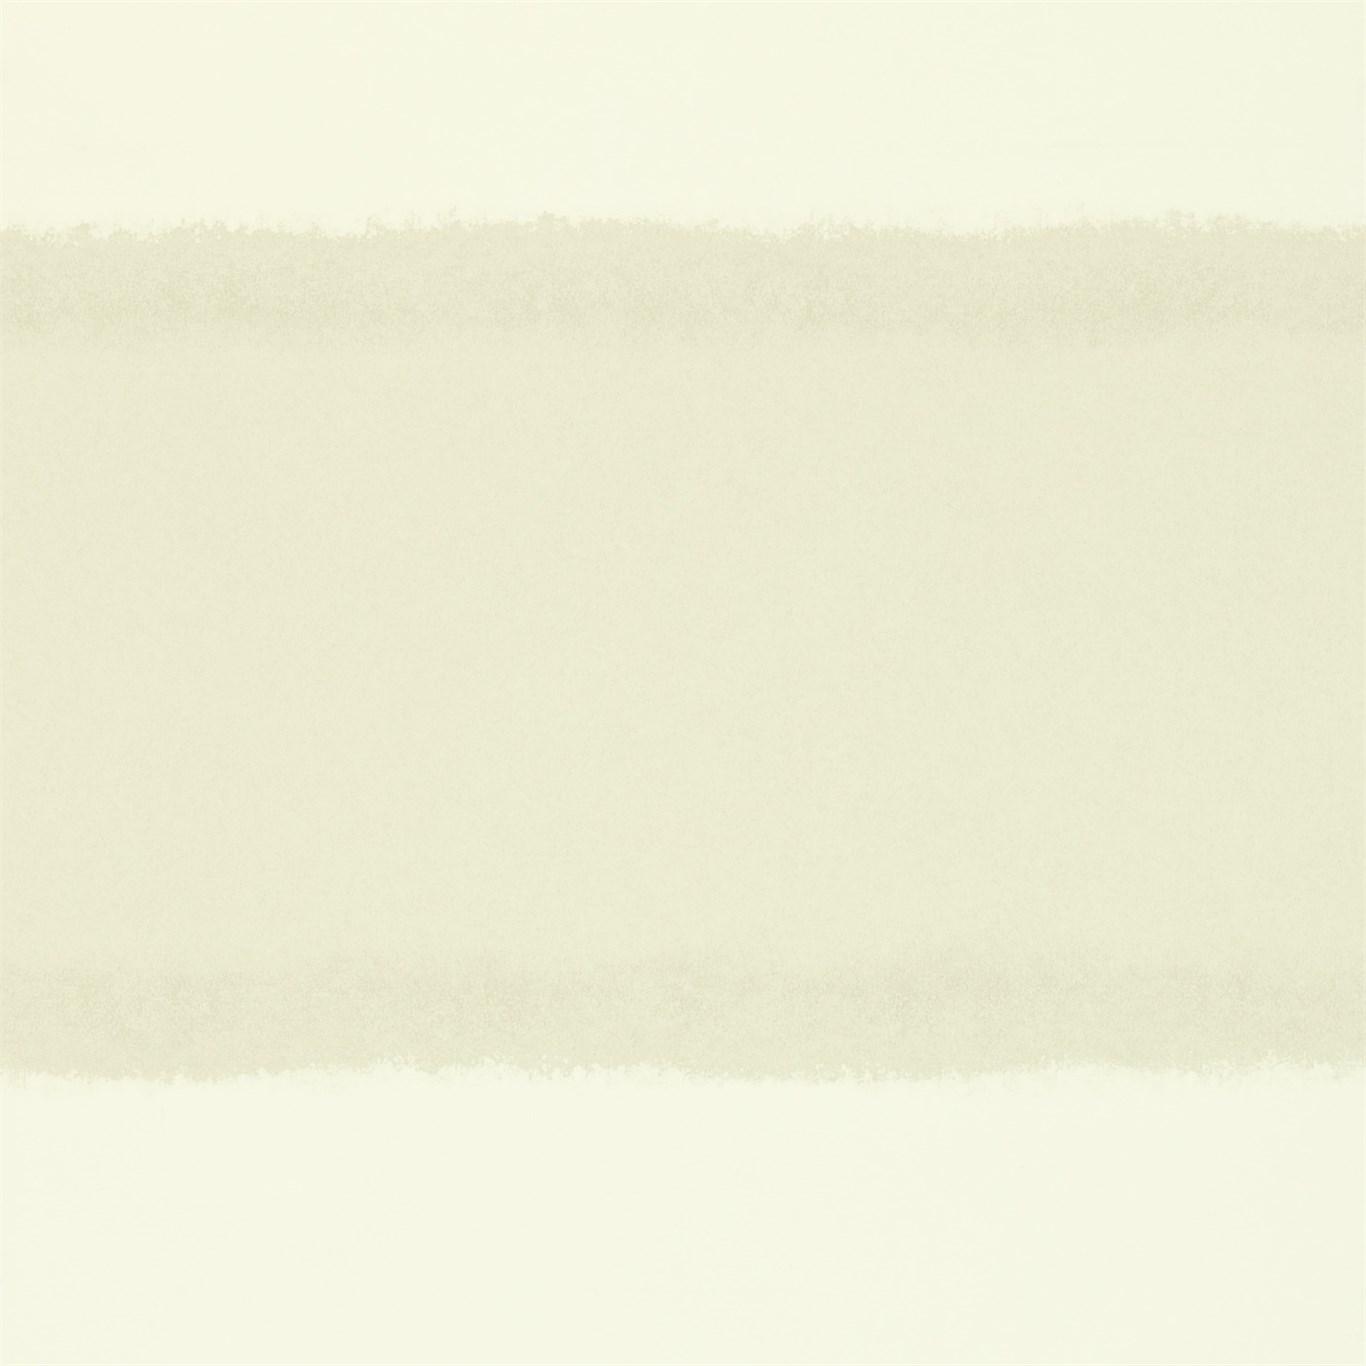 Английские обои Harlequin,  коллекция Landscapes, артикулHLAN110509